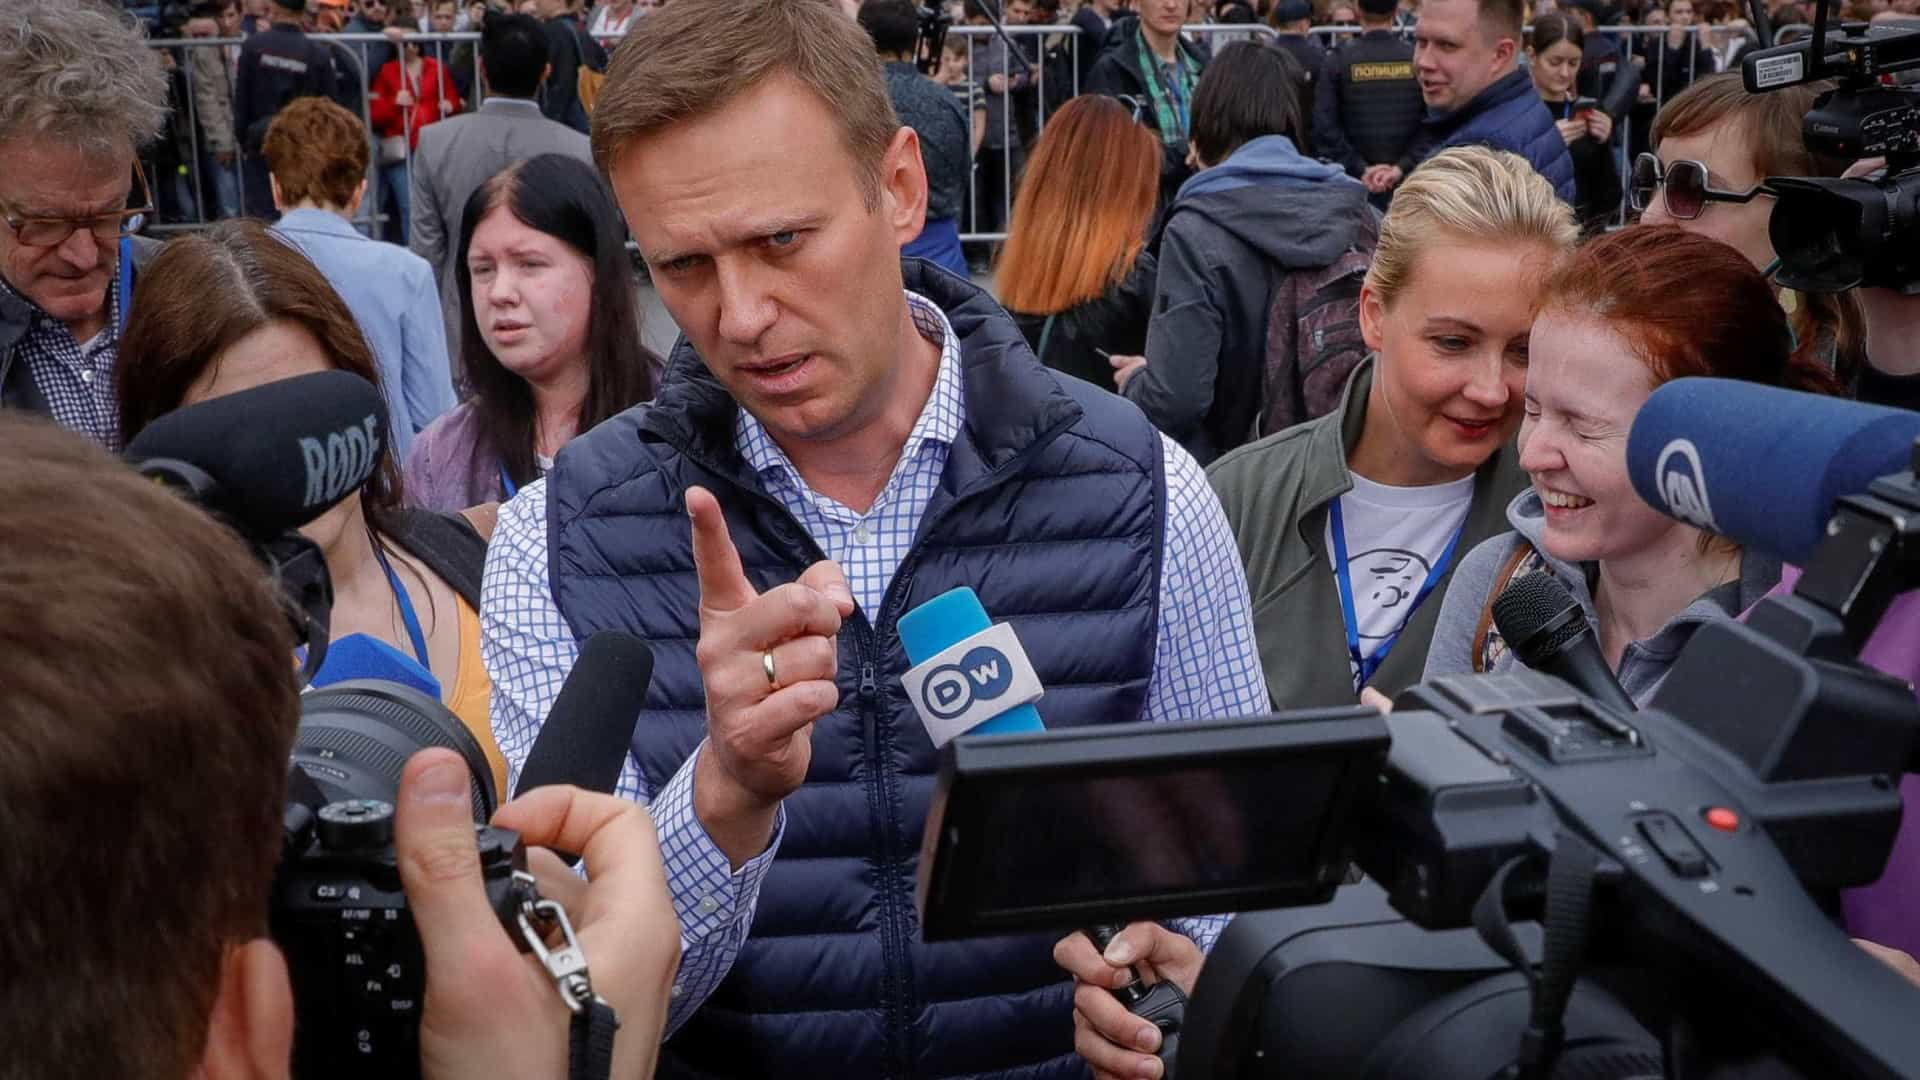 Opositor de Putin marca protesto, mas evita sedes da Copa